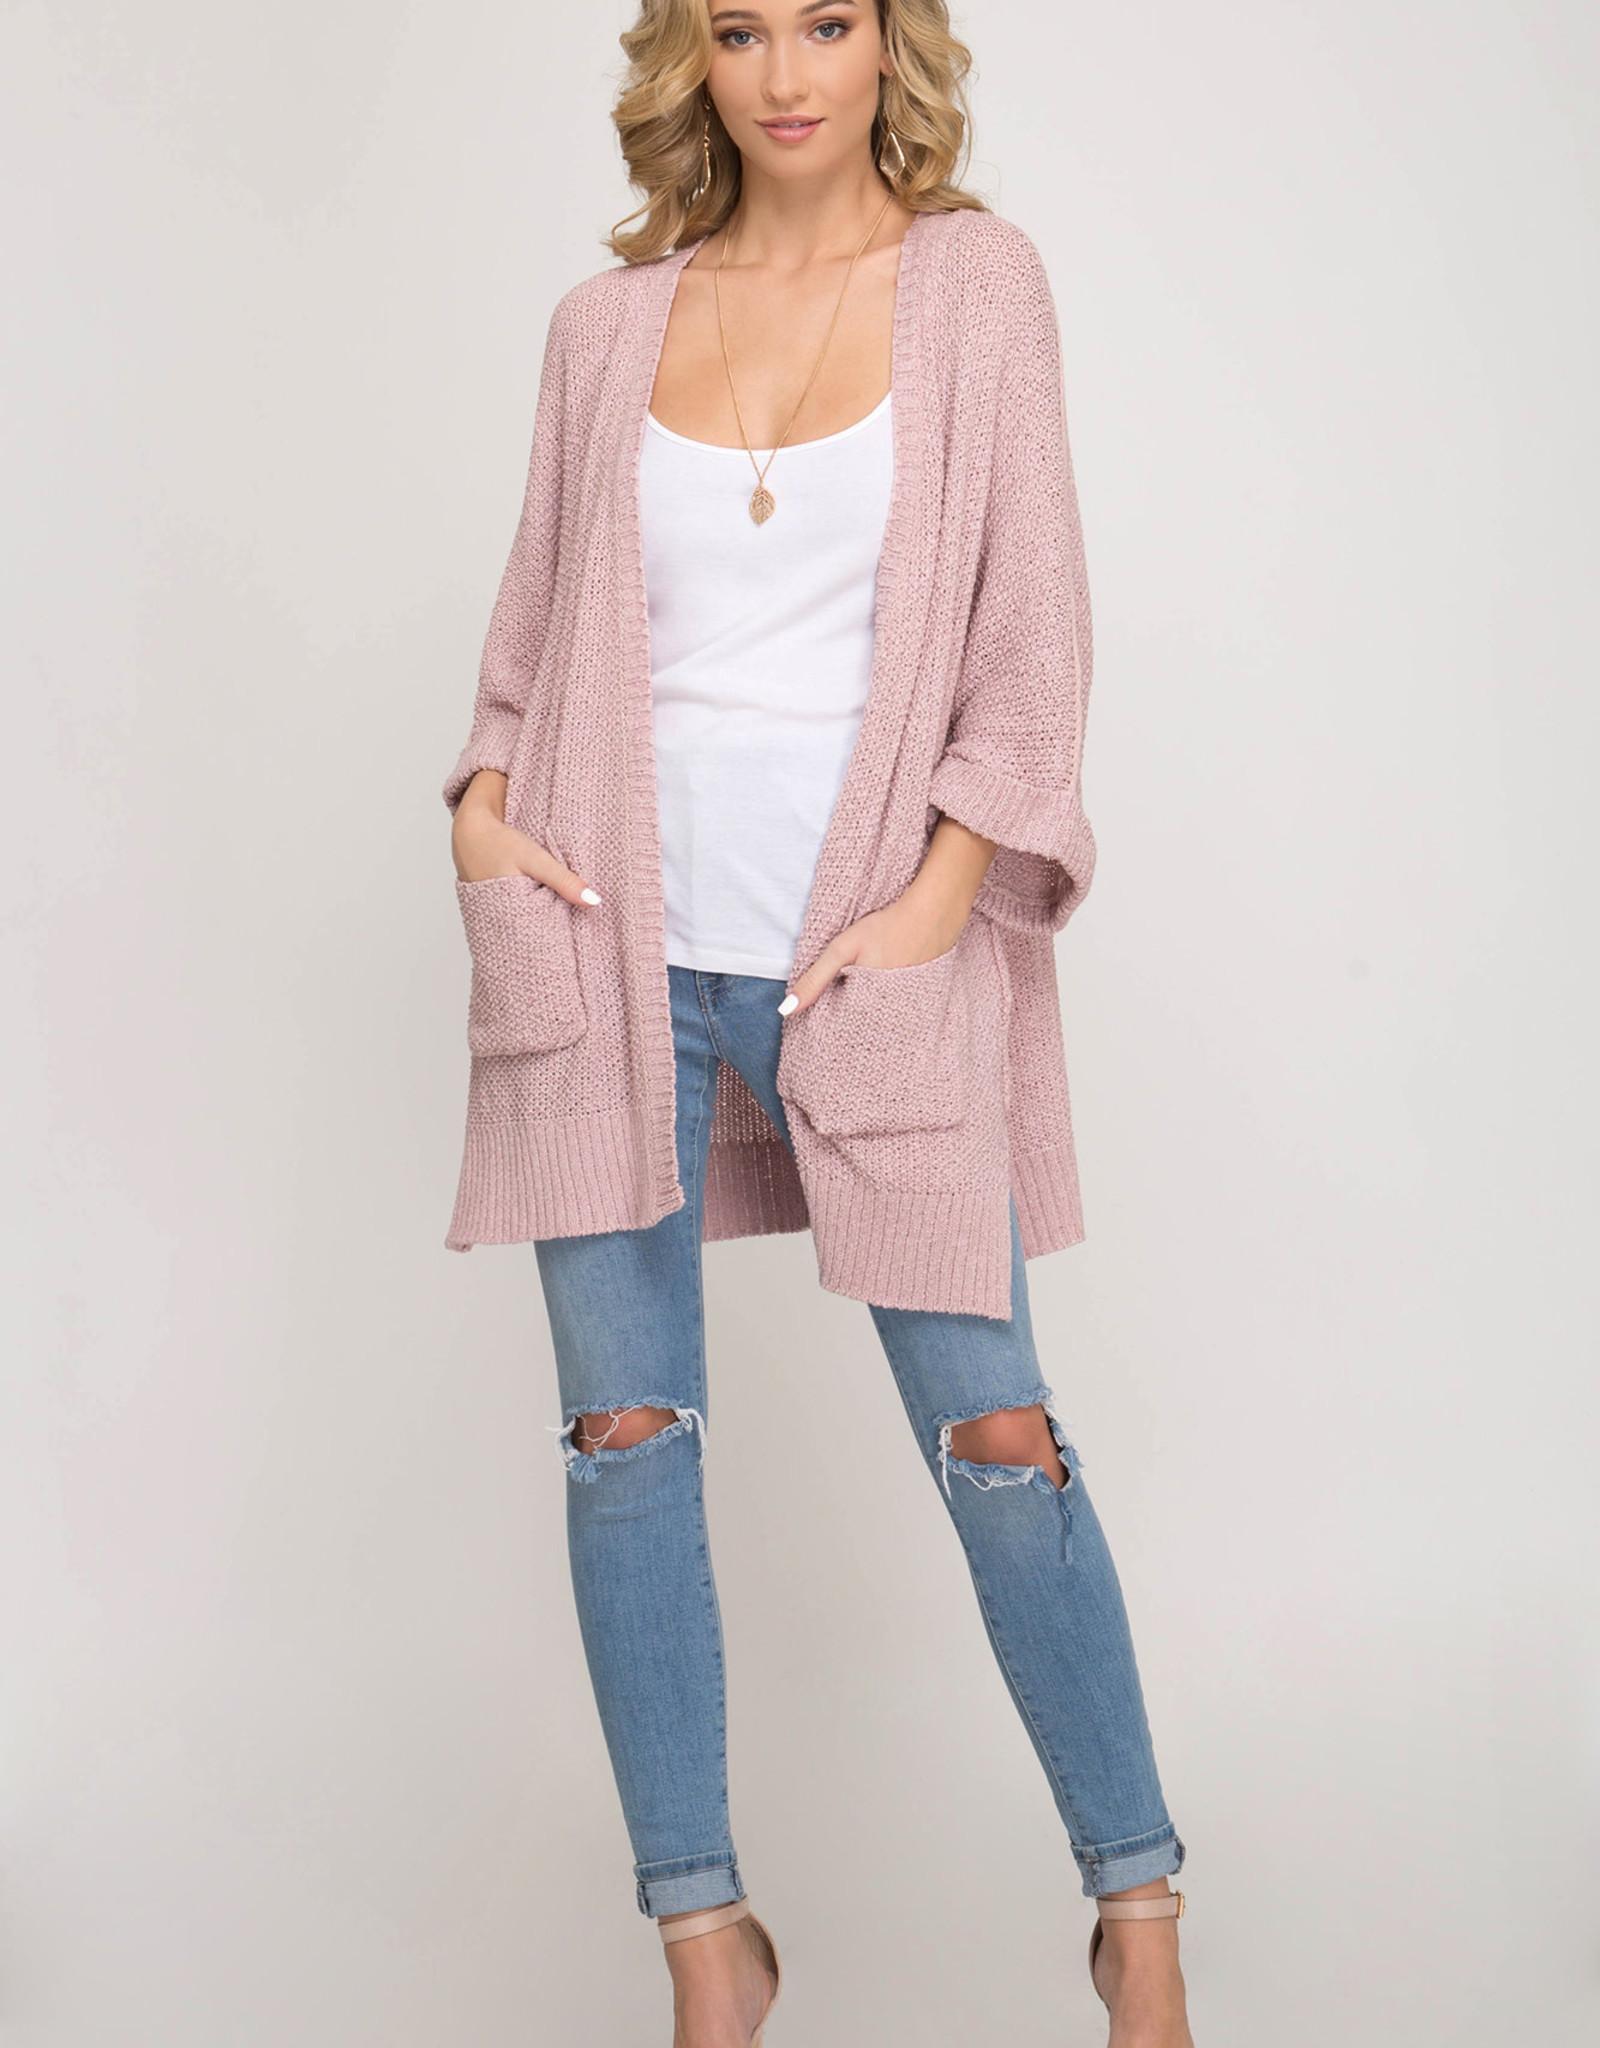 - Misty Pink Half Sleeve Cardigan w/Pockets